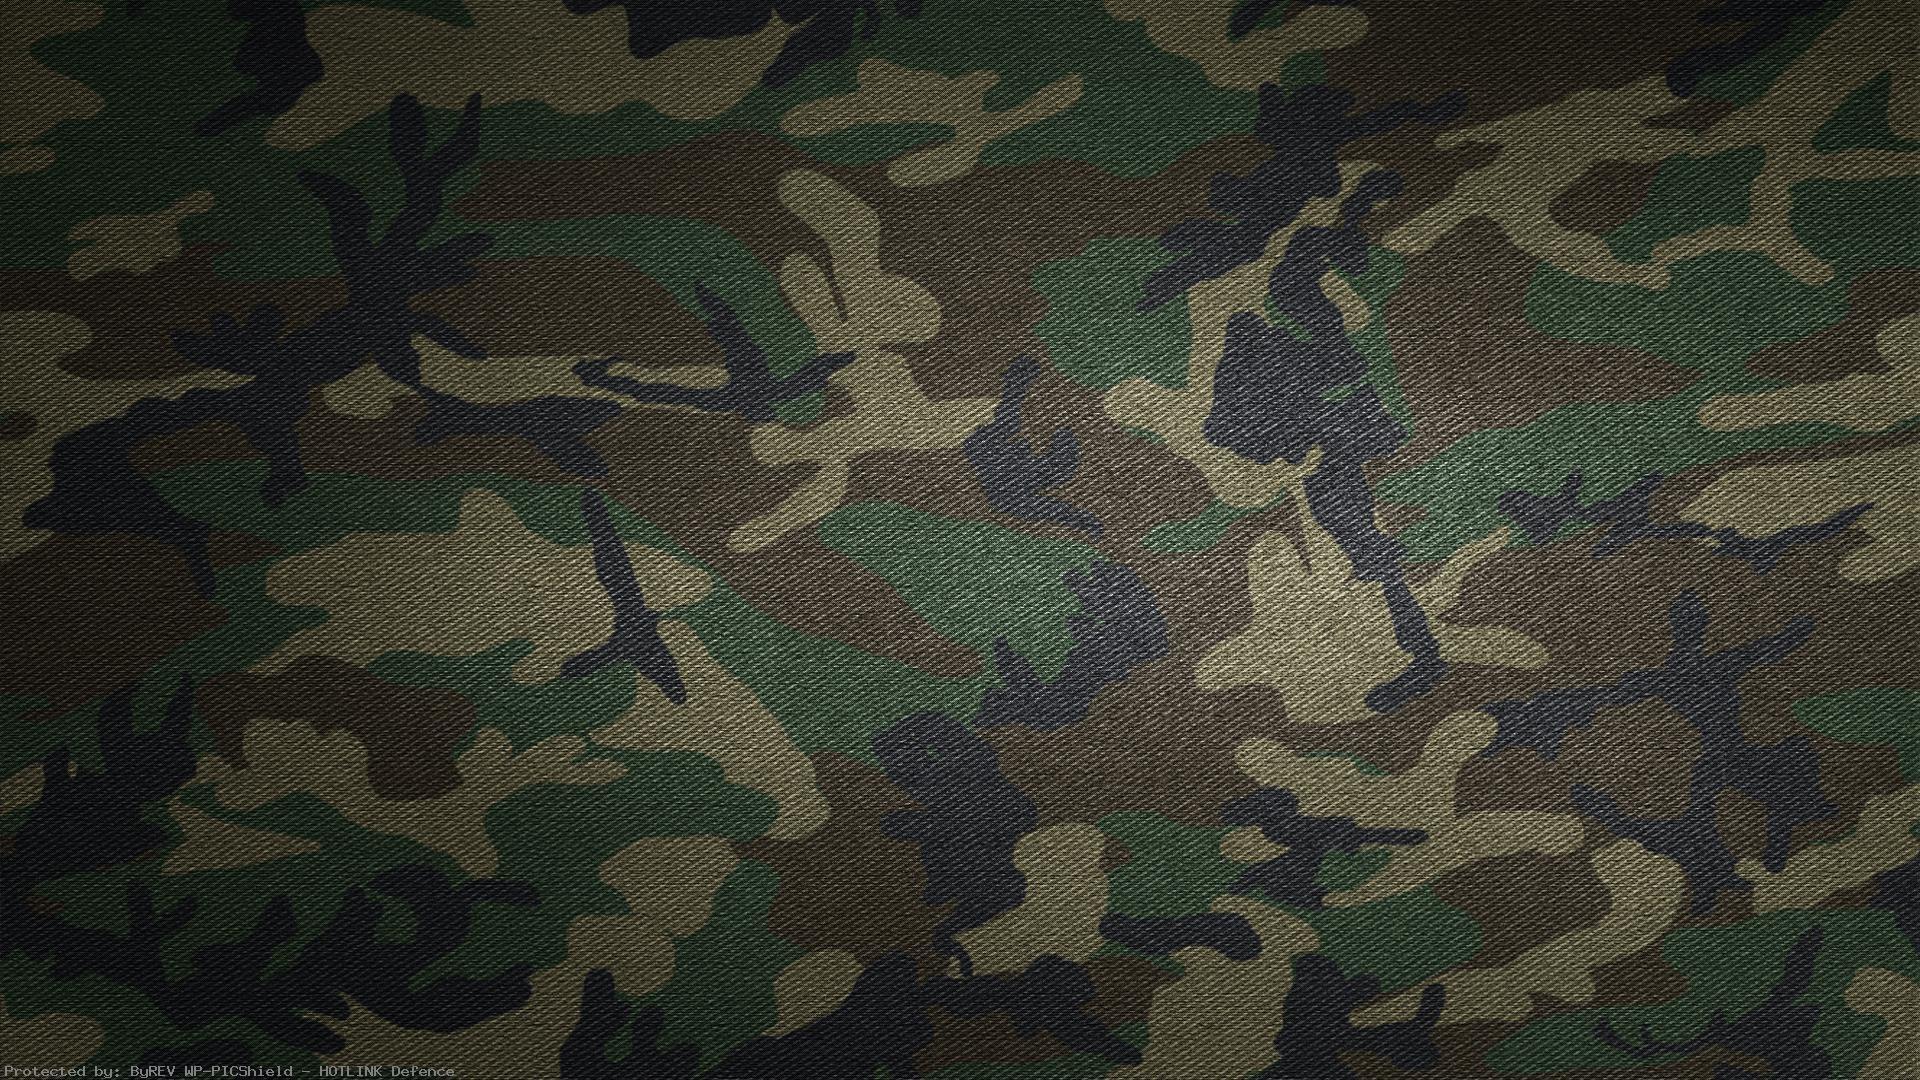 free-desktop-backgrounds-for-military-wallpaper-wp6001392